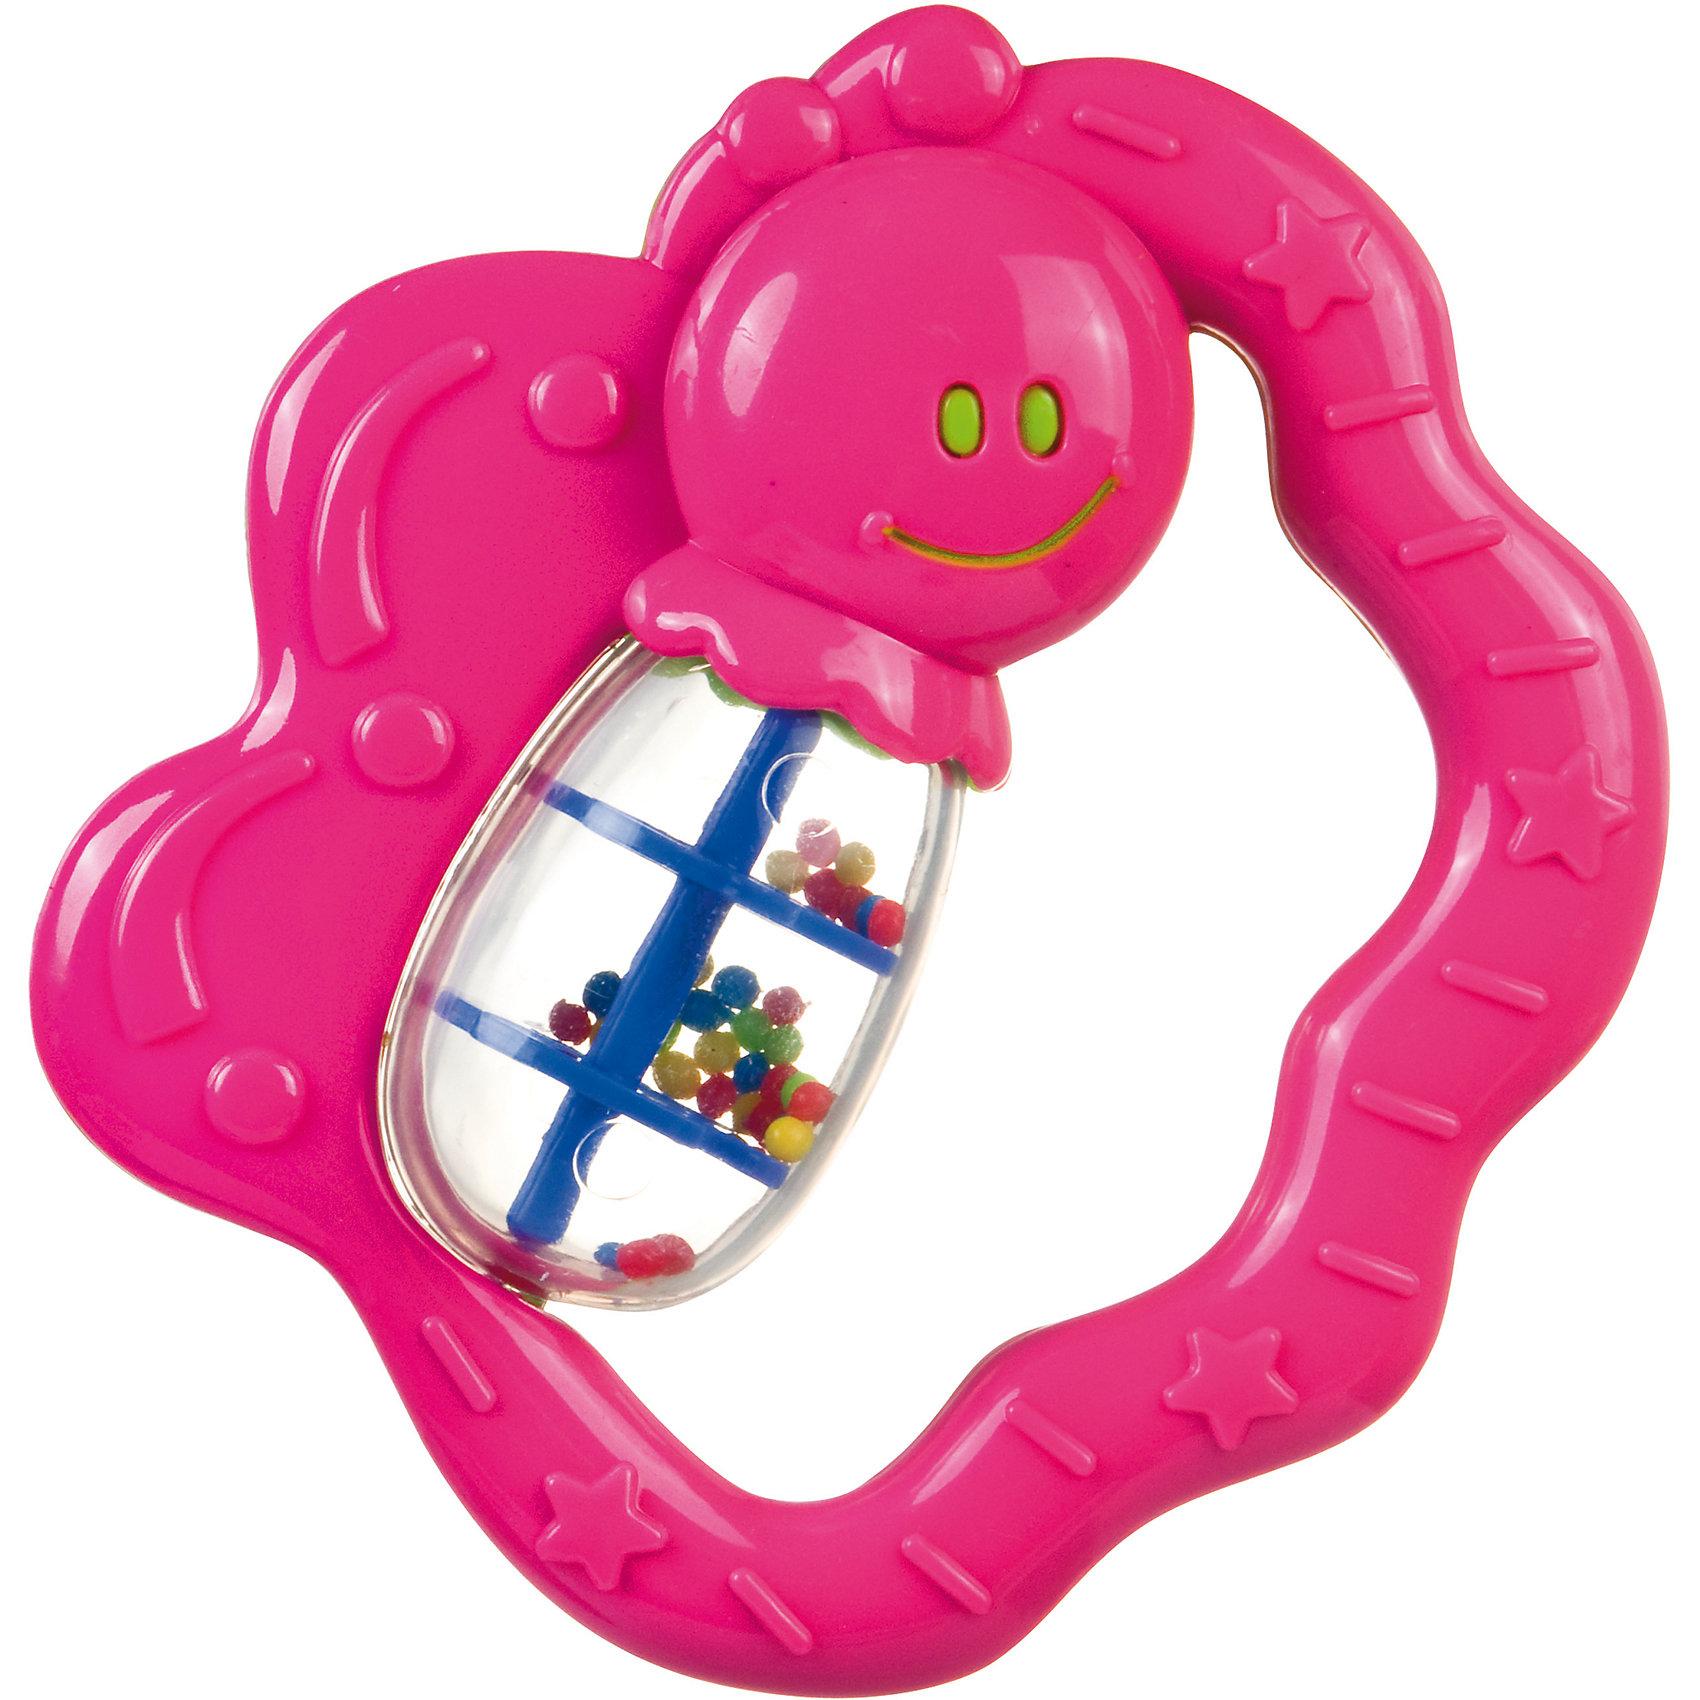 Canpol Babies Погремушка Бабочка, 0+, Canpol Babies, розовый